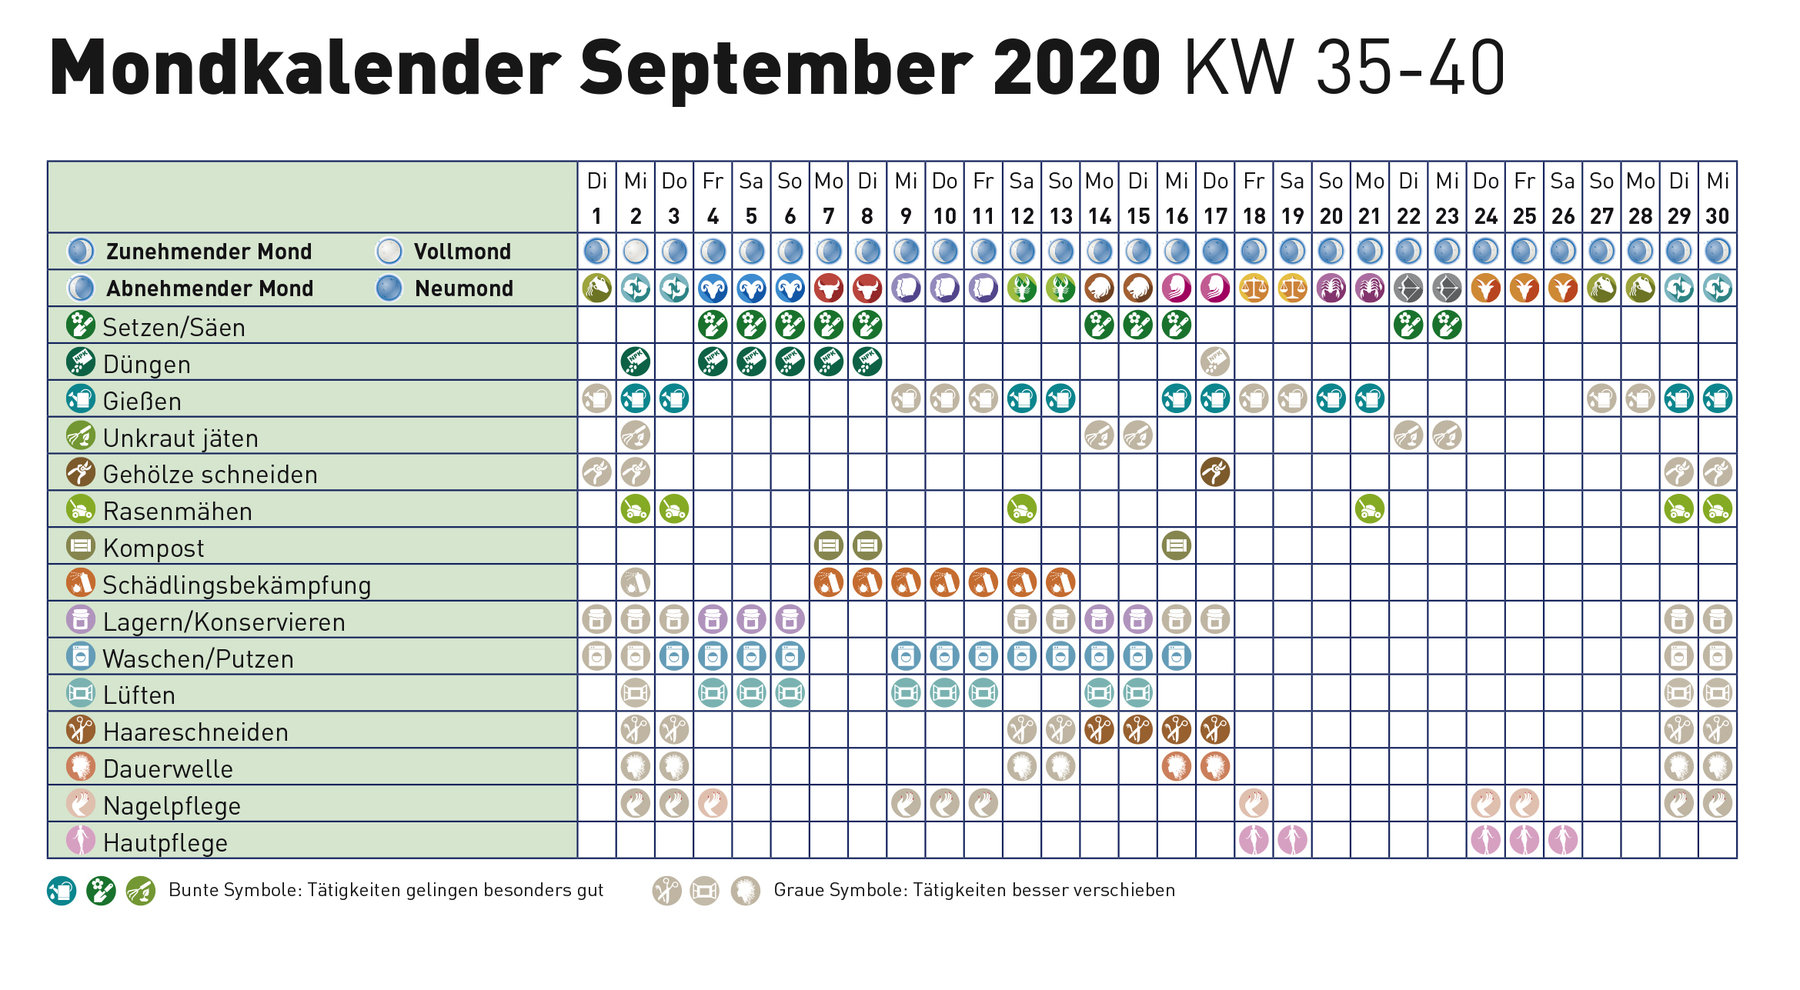 Mondkalender november 2020